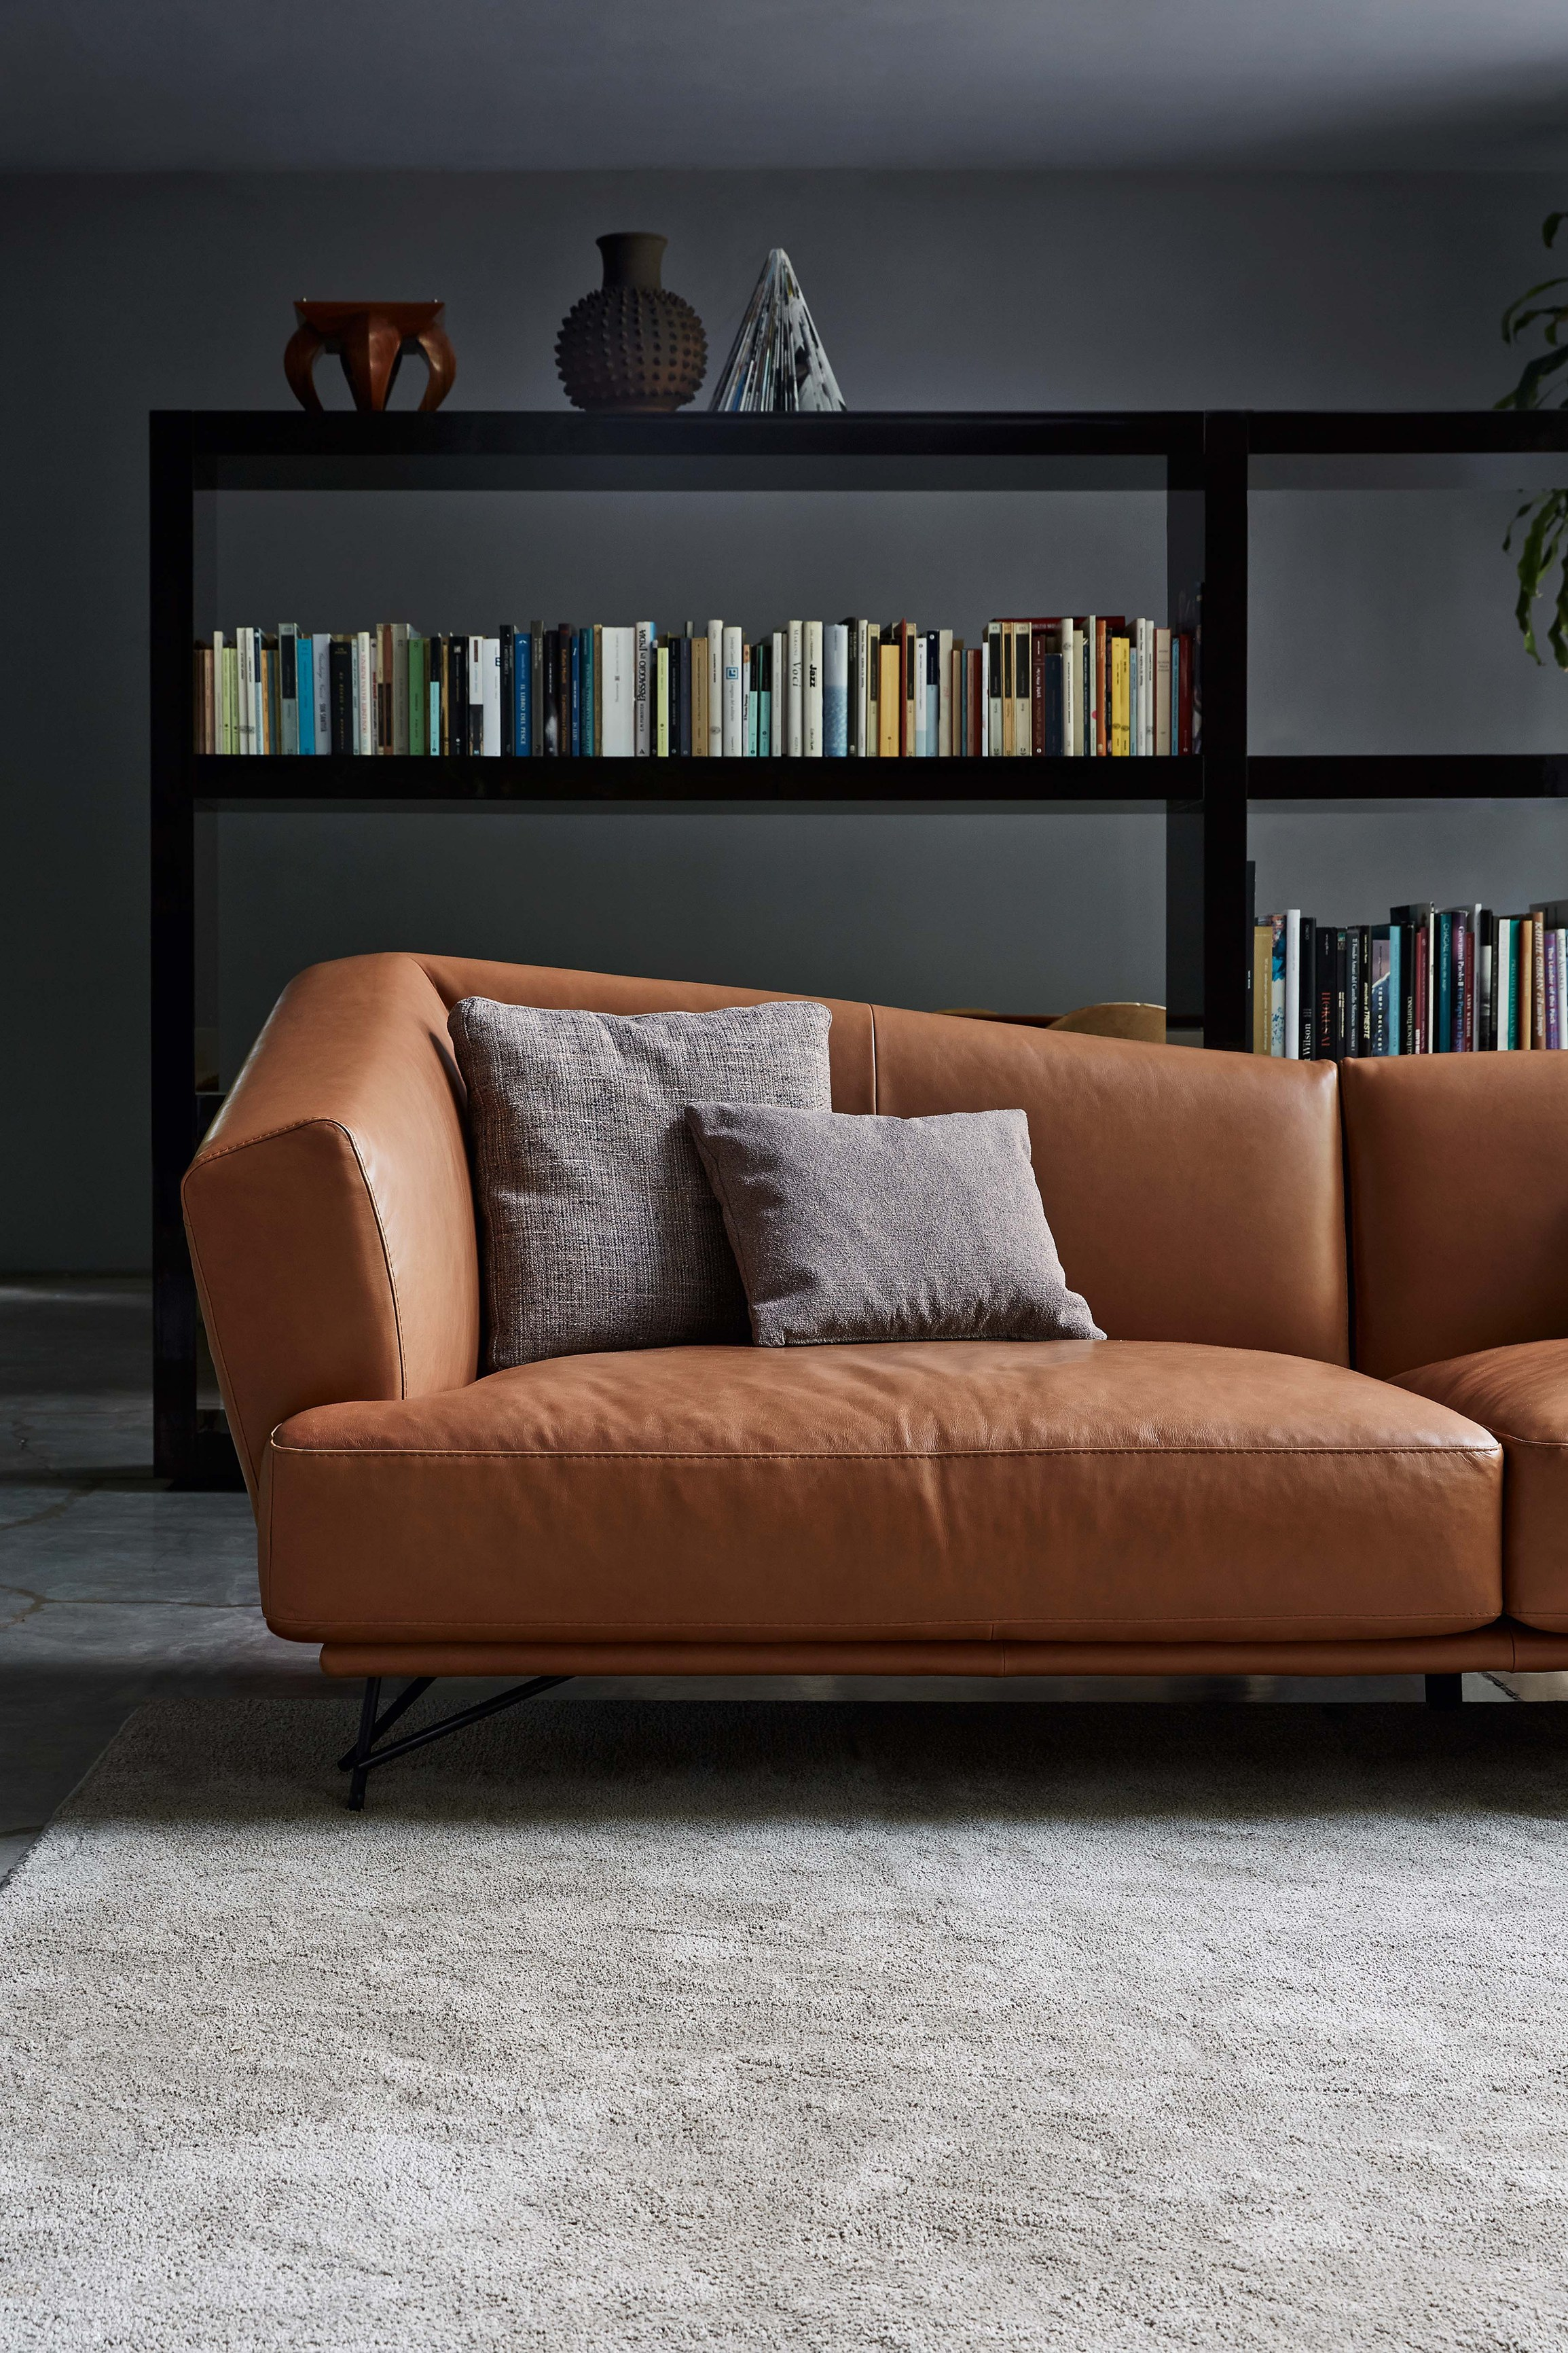 Lennox sofa by ditre italia design stefano spessotto for Divani design italia